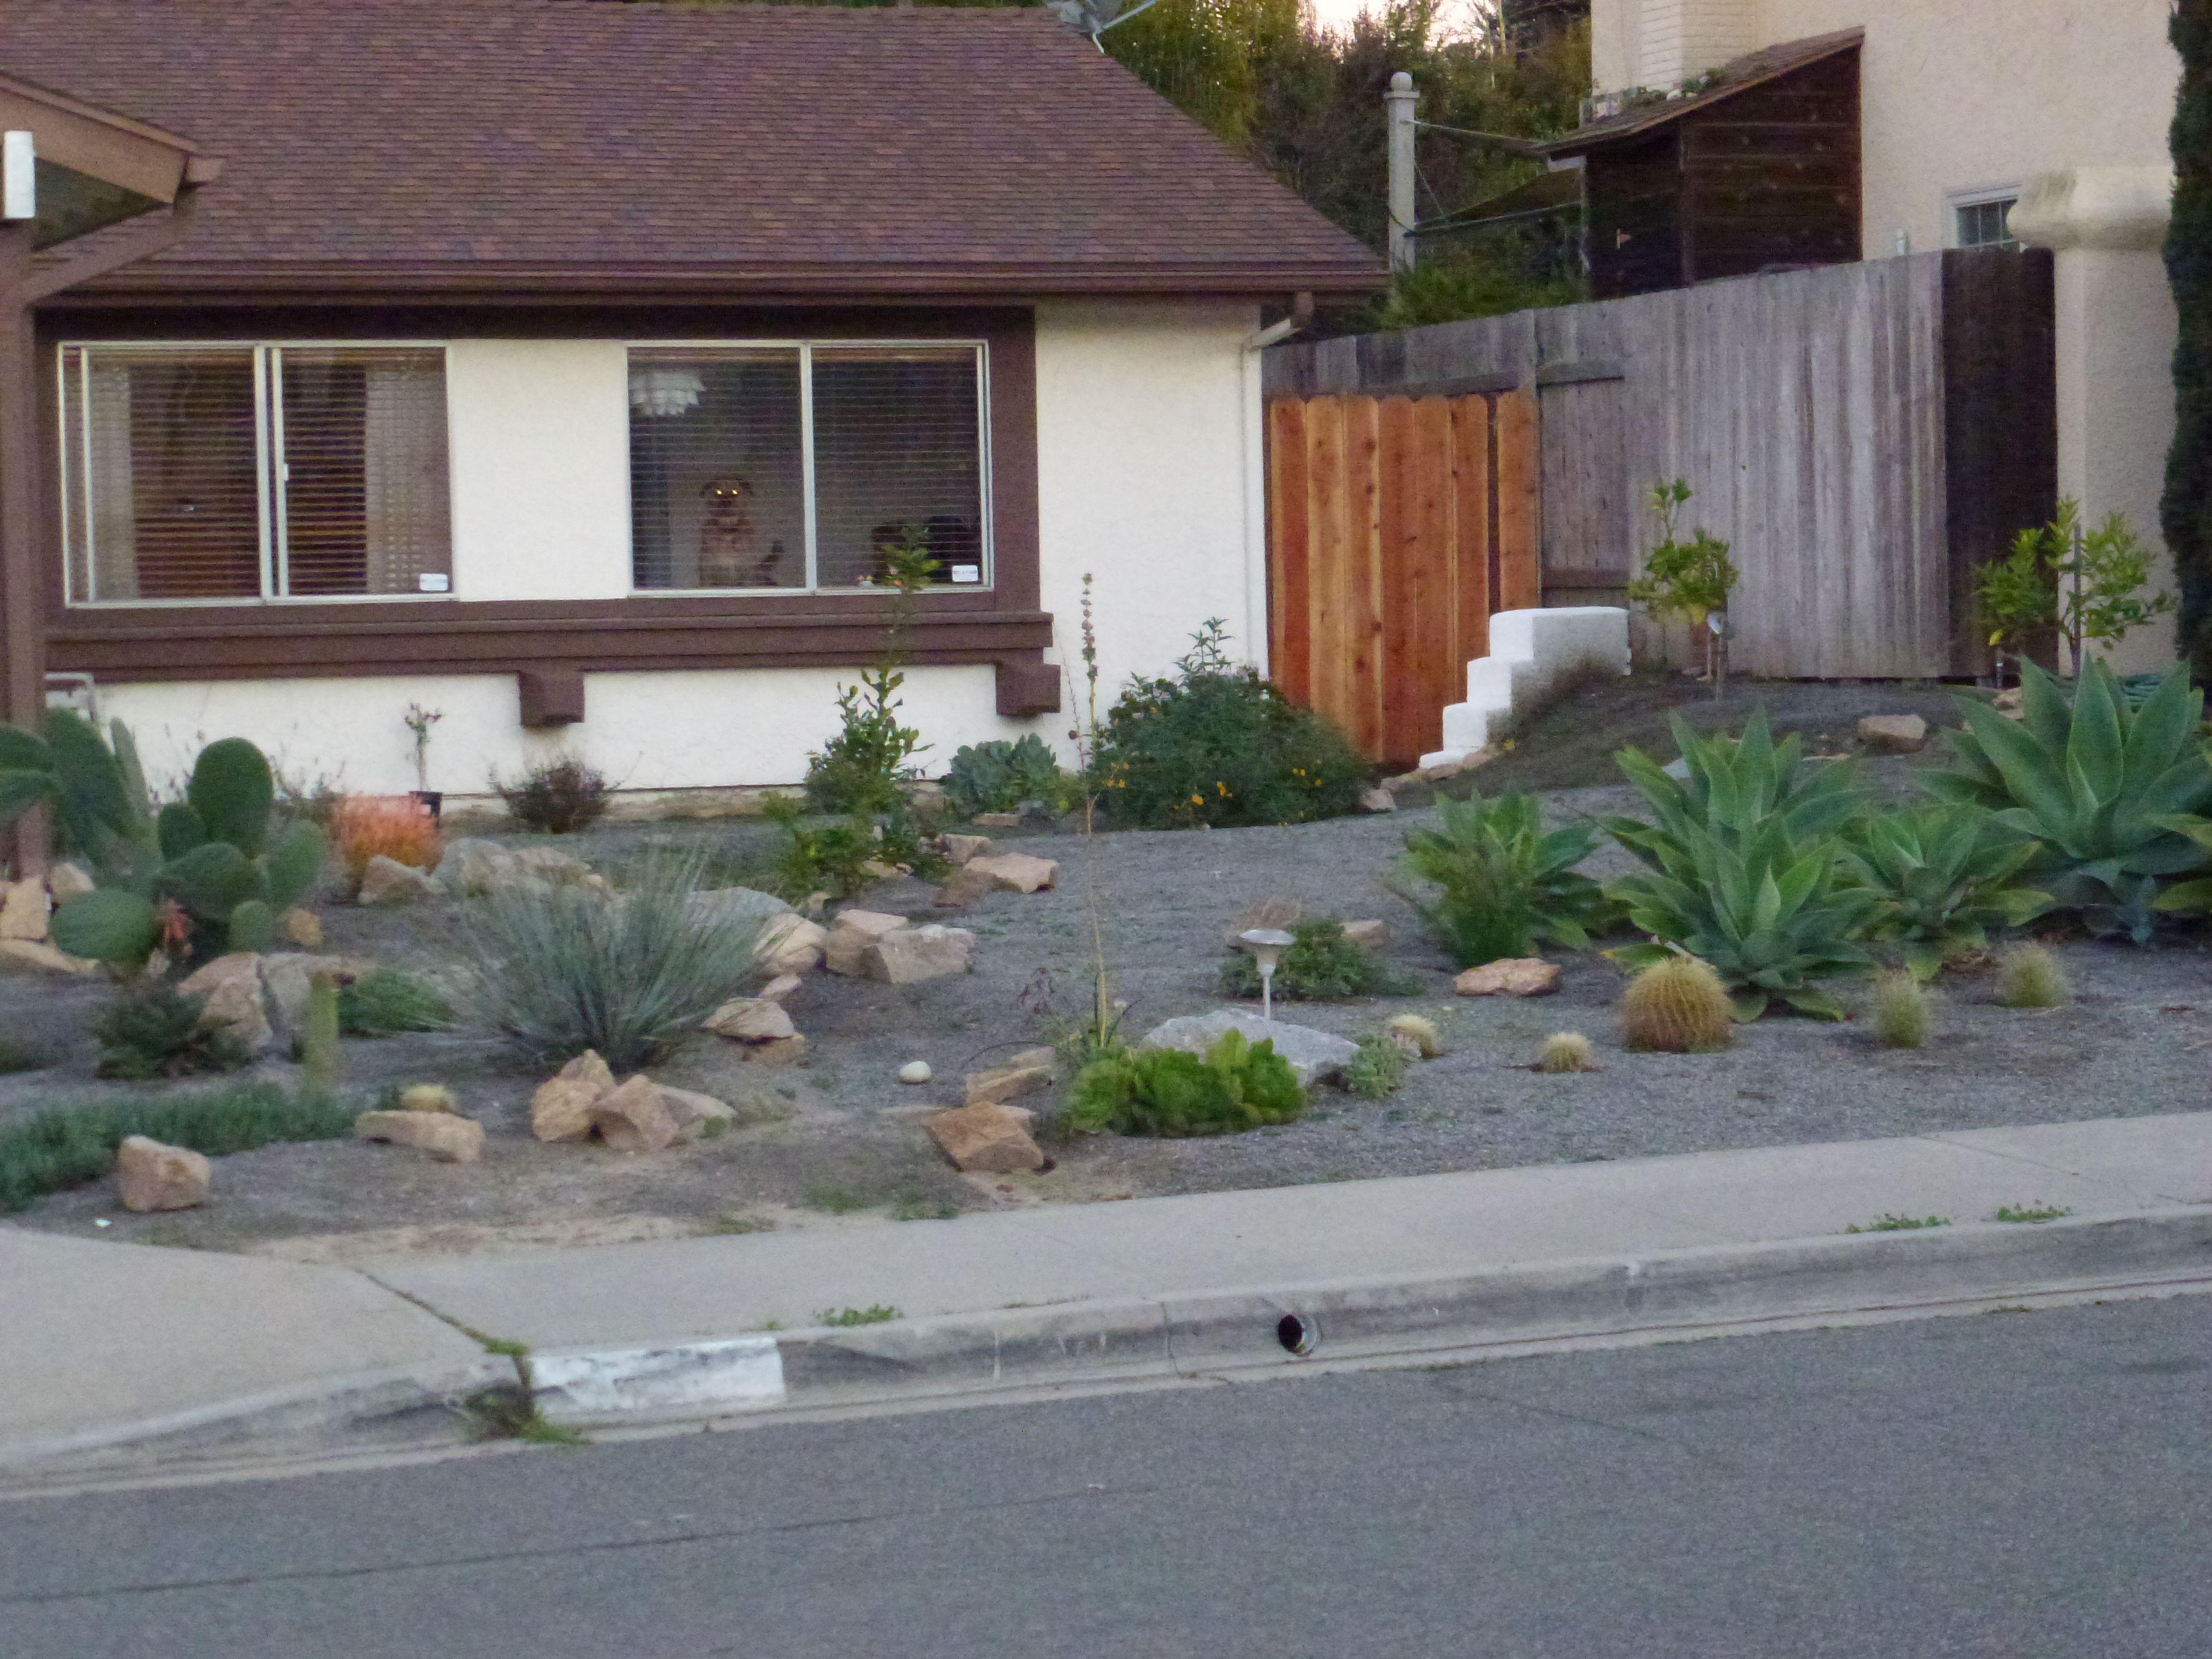 grassless backyard landscaping ideas Jenny Peterson February 2